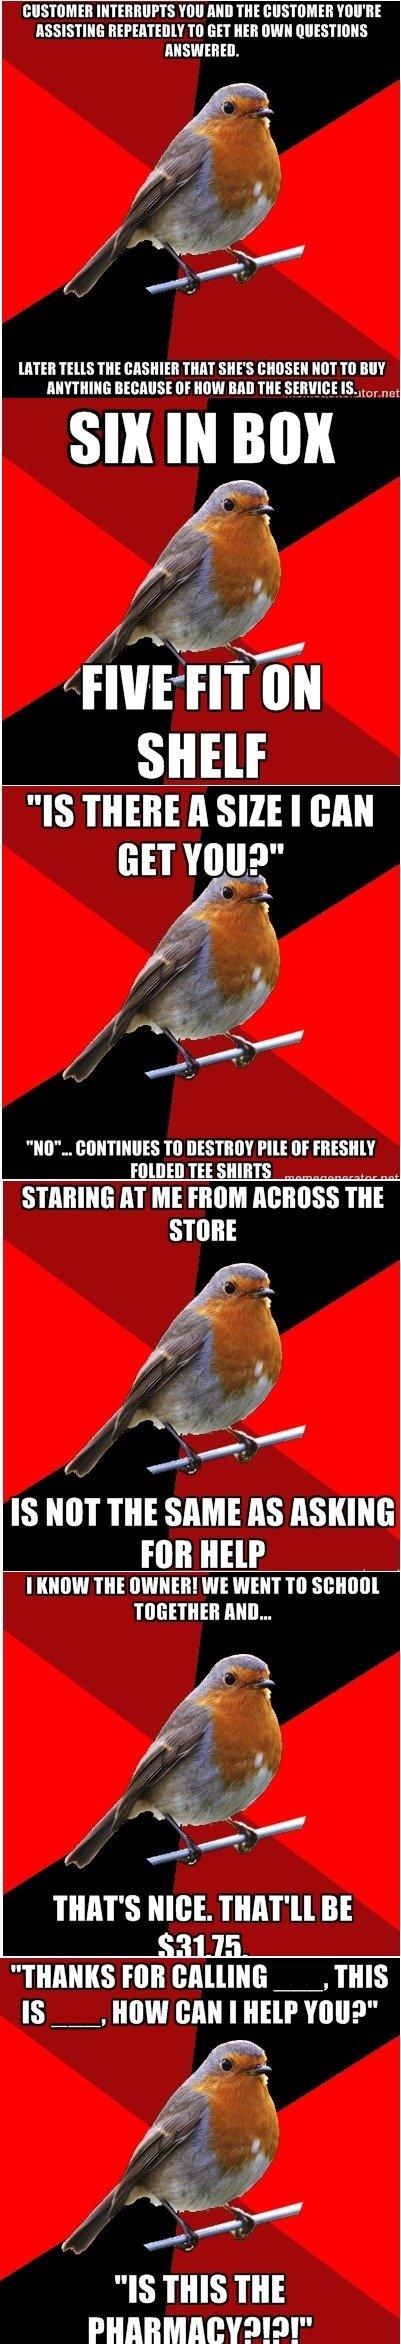 "Retail Robin comp, pt 2. Here's the first one: /funny_pictures/3912163/Retail+Robin+.... INN AHI] m I' VIII' HE IIEK' "" TI] EH NEH WIN BITTEH nus m nun an MR Fl retail robin"